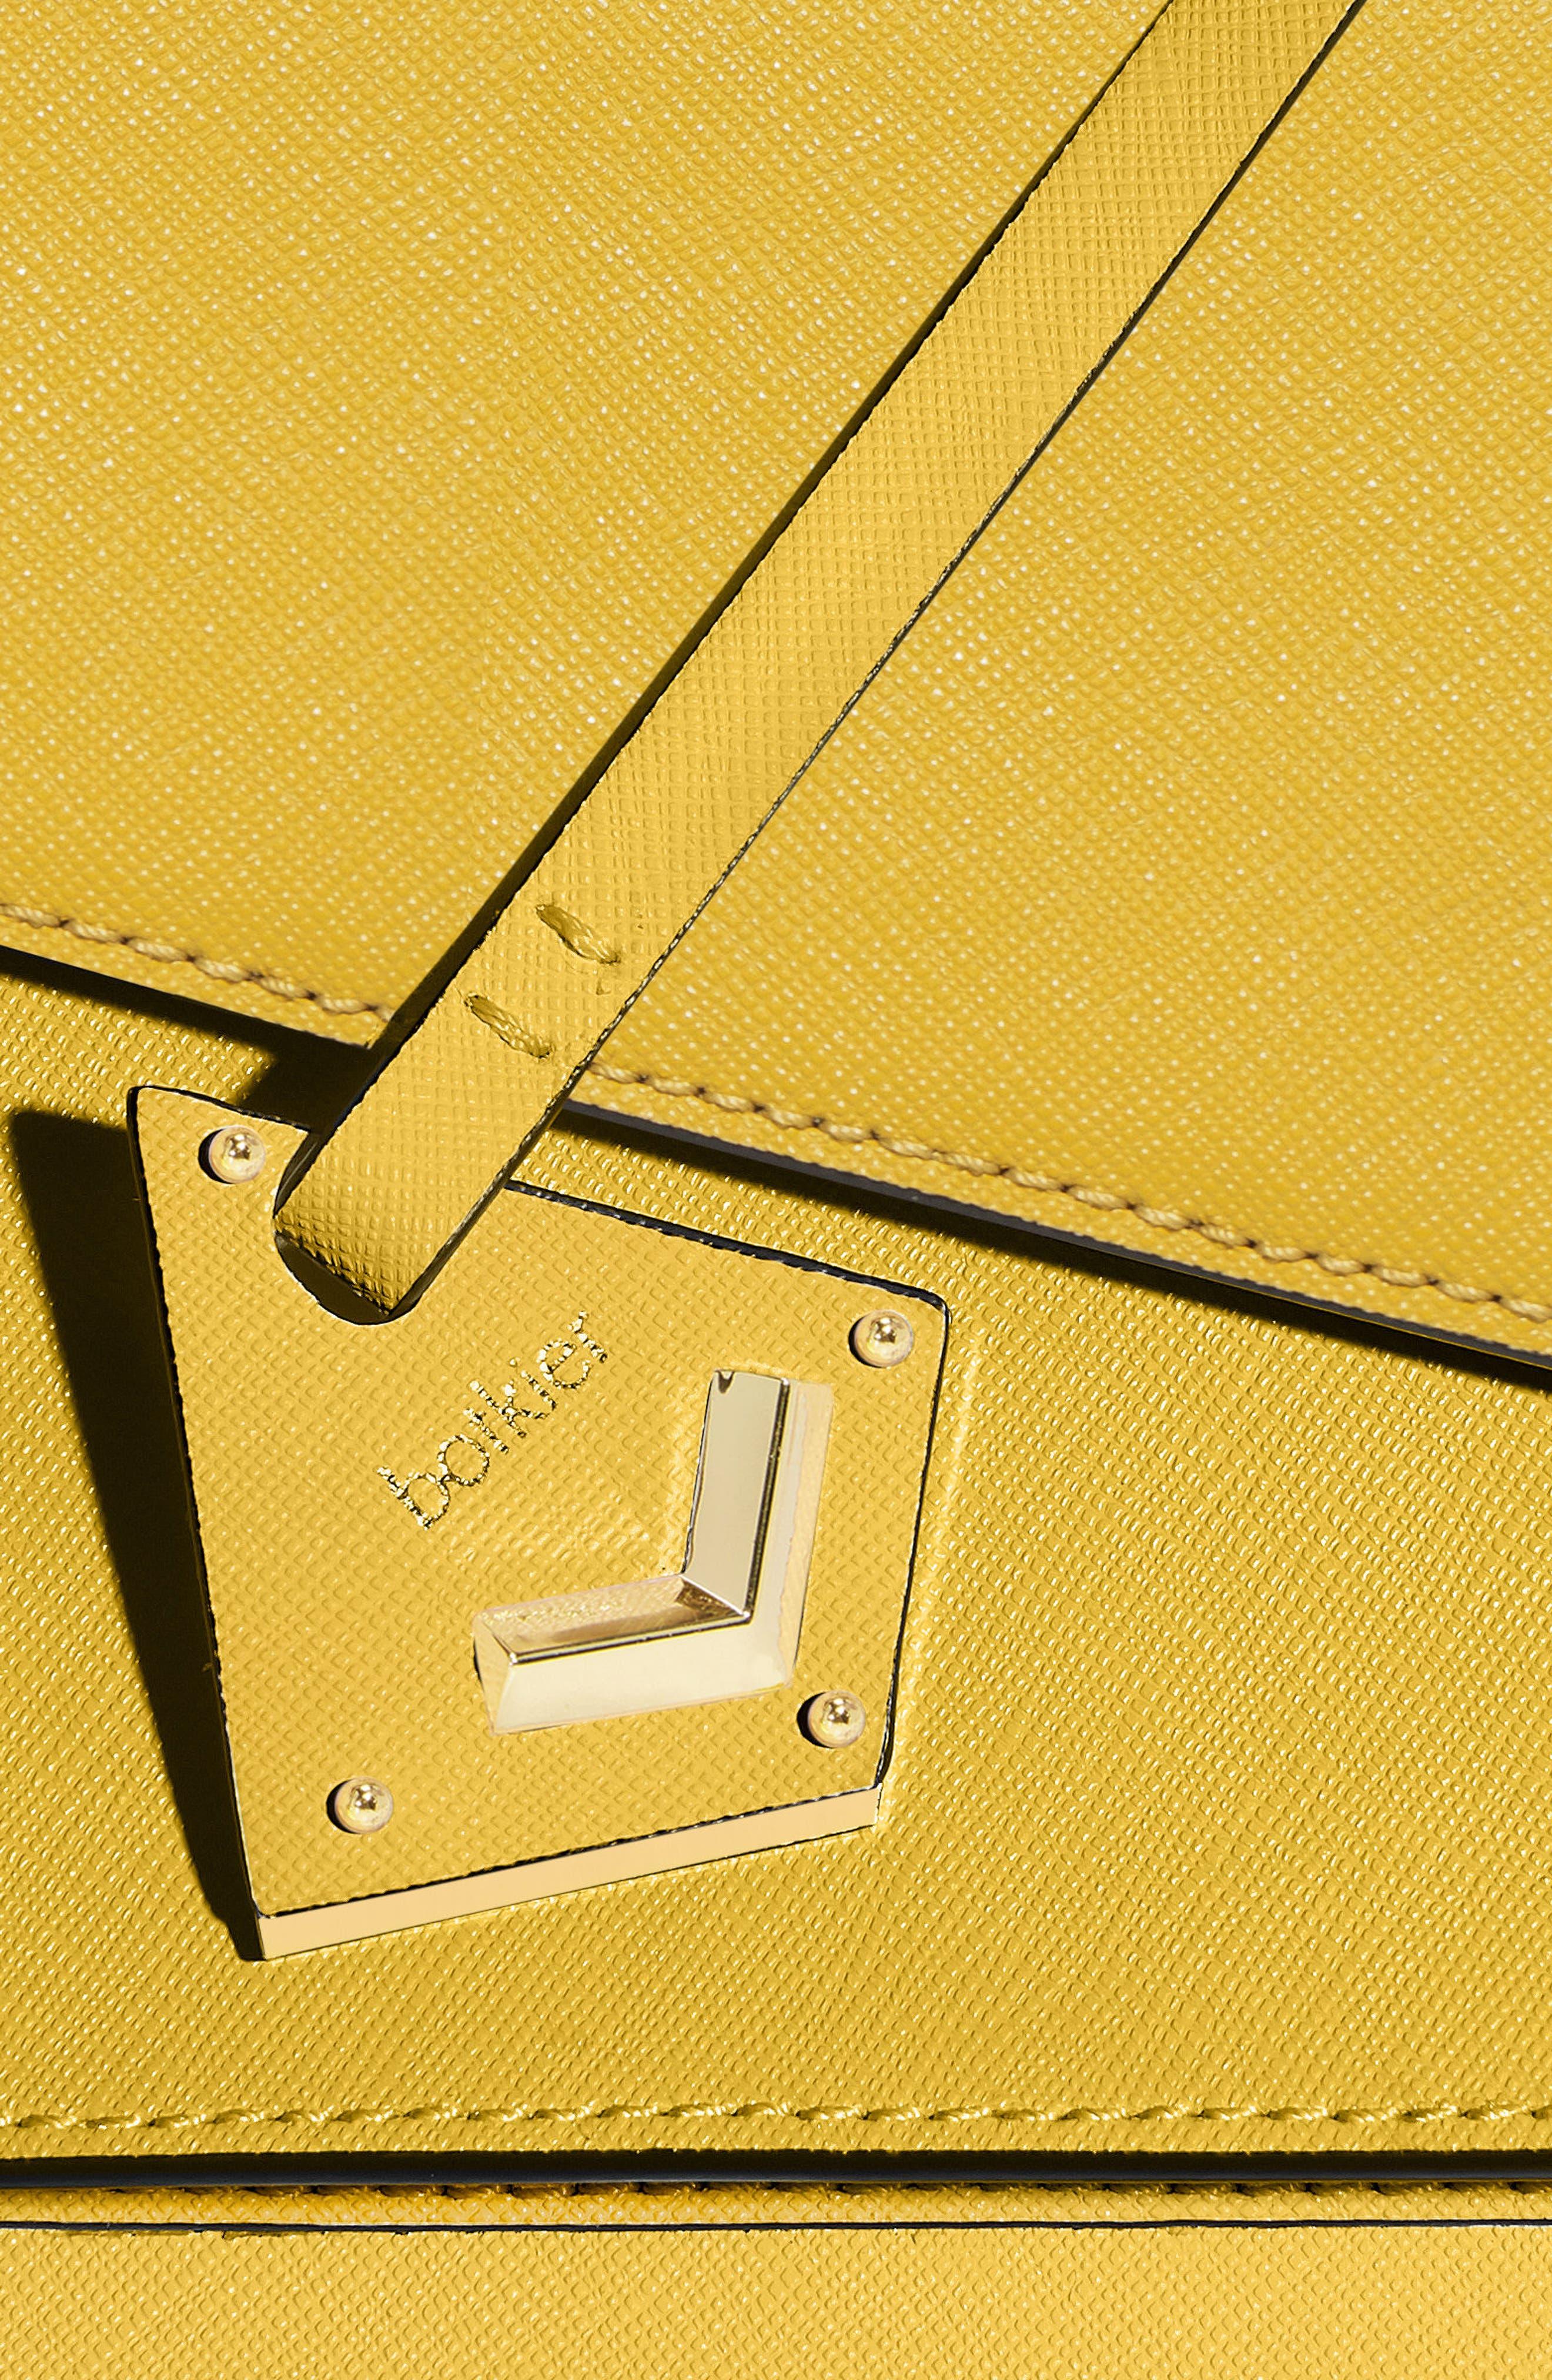 Cobble Hill Leather Crossbody Bag,                             Alternate thumbnail 114, color,